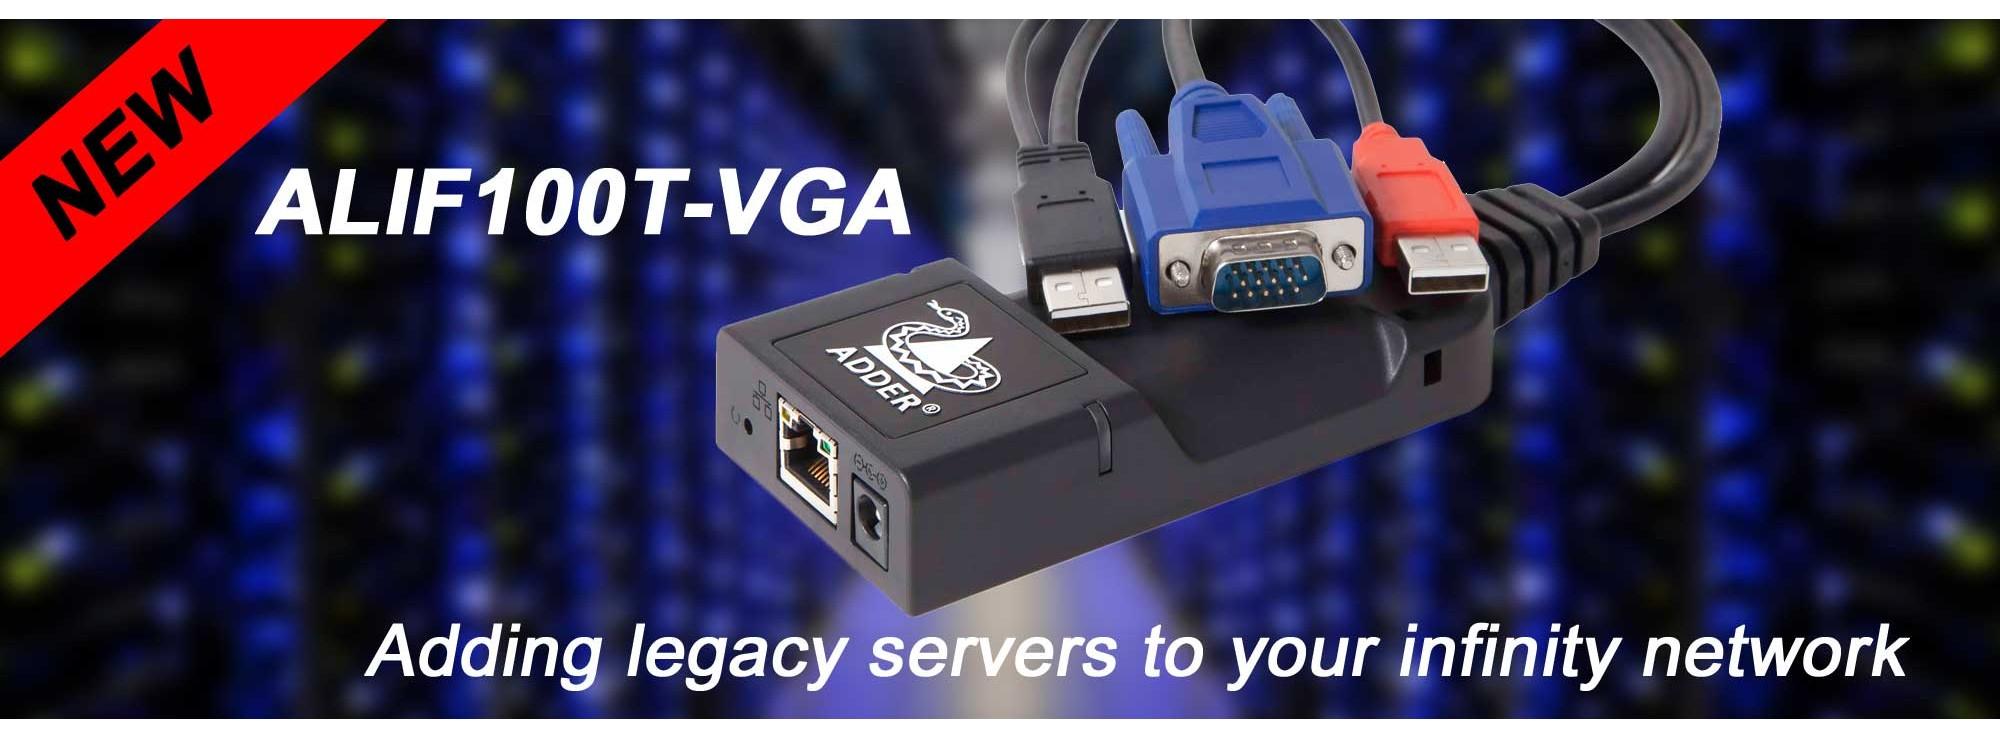 INFINITY ALIF100T-VGA